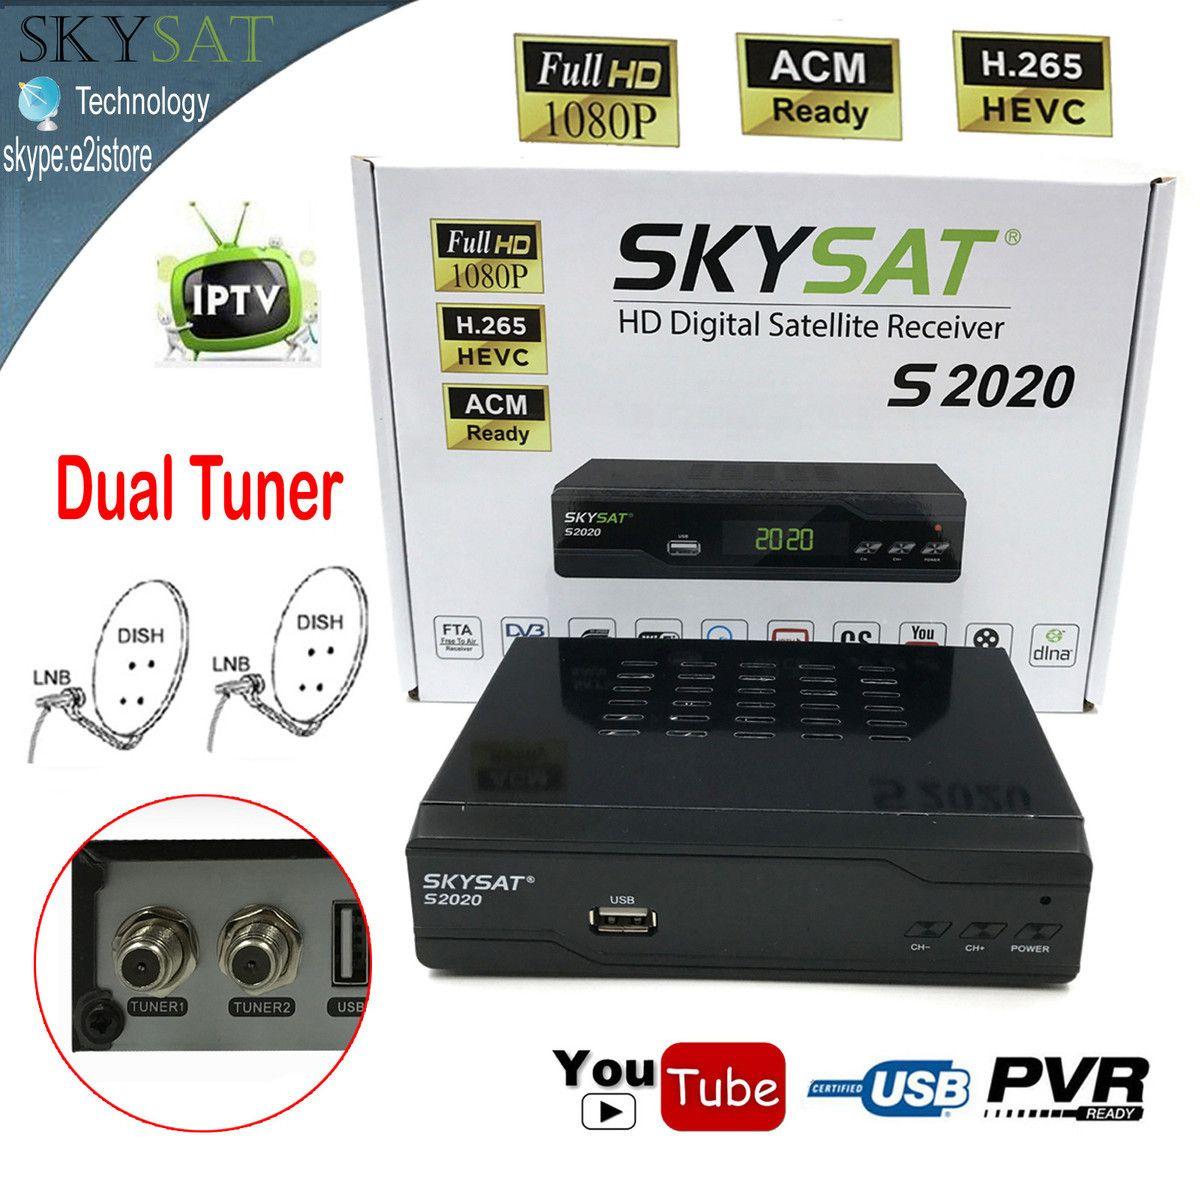 Skysat Dual Dish Twin Tuner H.265 AVC MPEG-4 Digital Satellite Receiver ACM Most Stable Server IKS SKS ACM/VCM/CCM IPTV with LAN